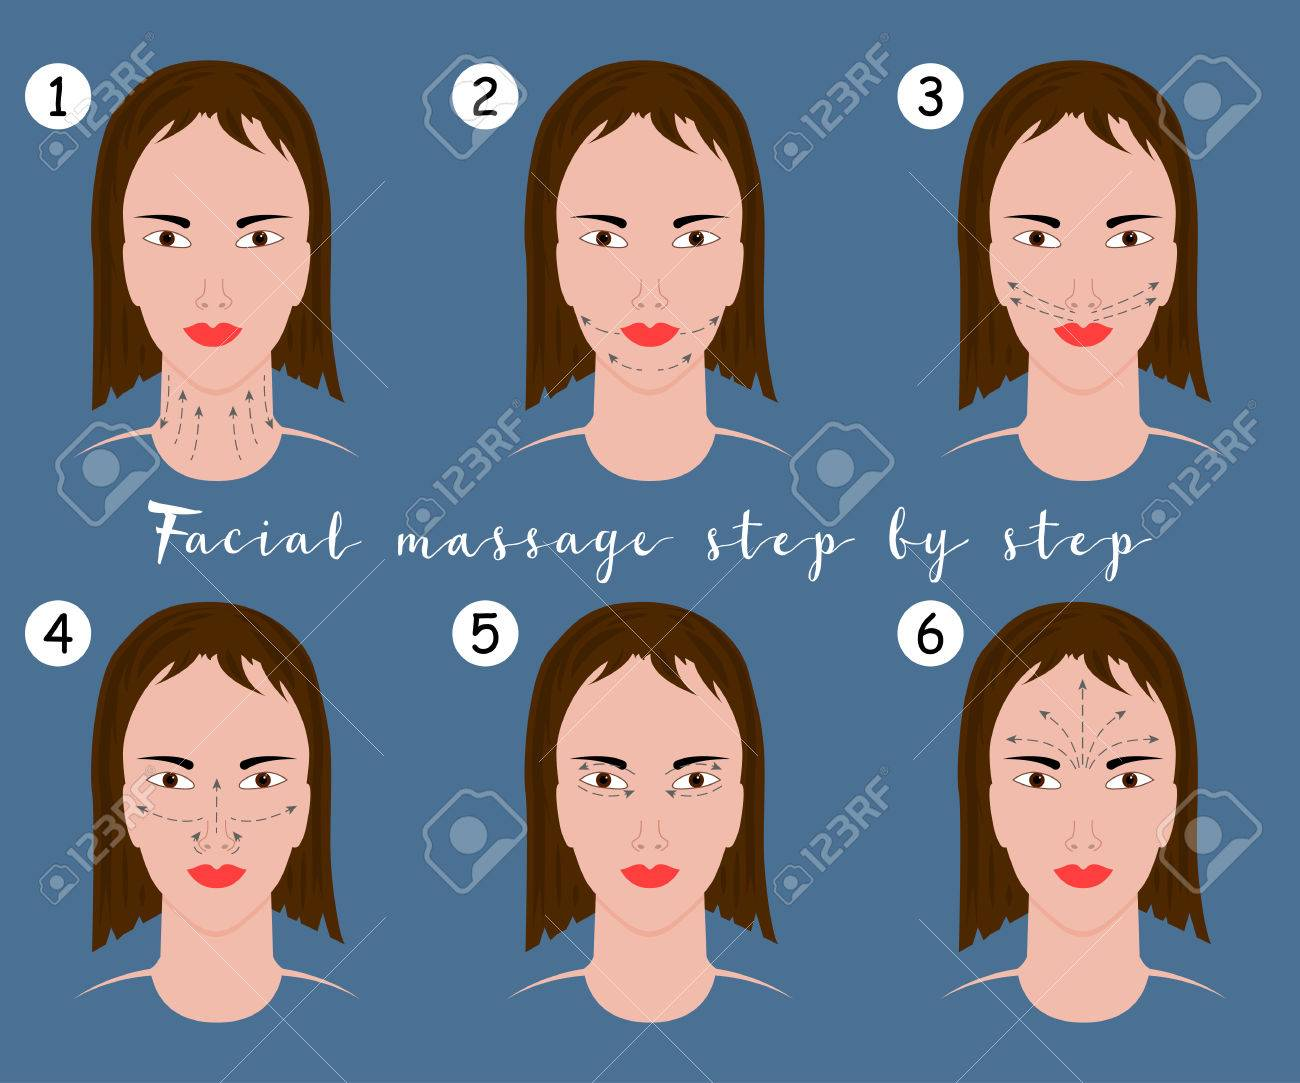 Set Of Face Massage Instructions Isolated On Blue Background